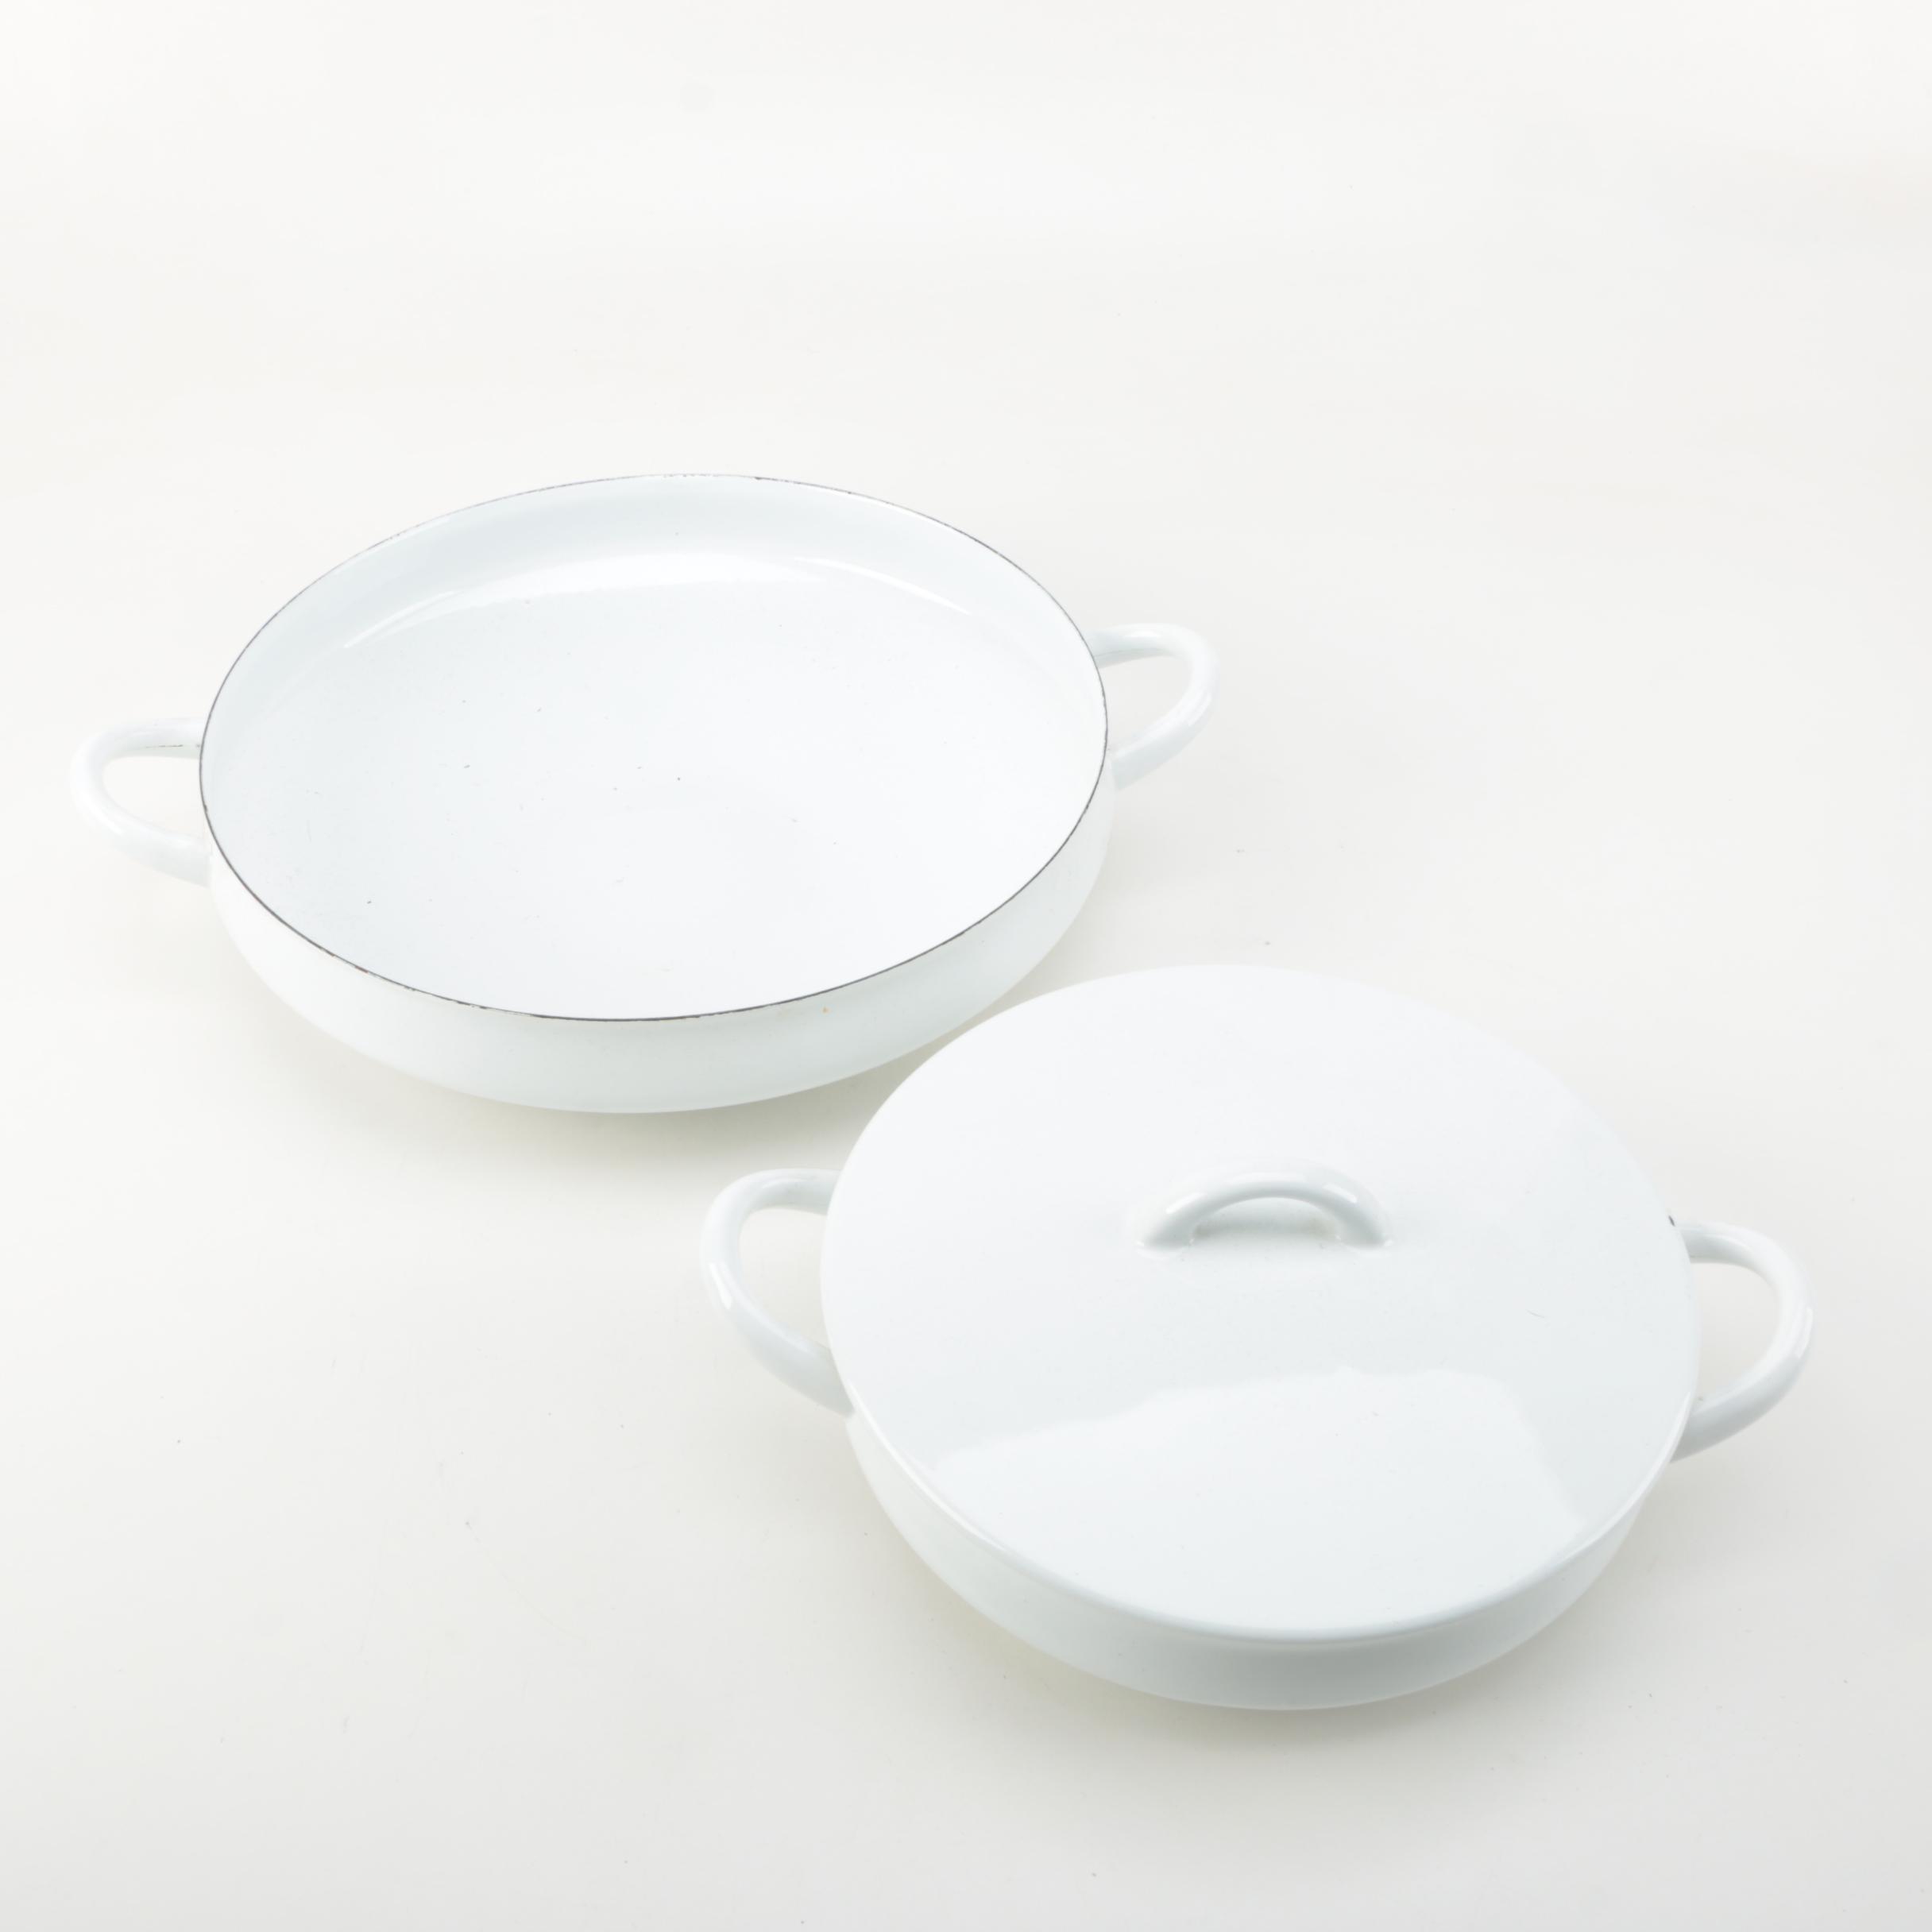 Dansk Enameled Cast Iron Cookware